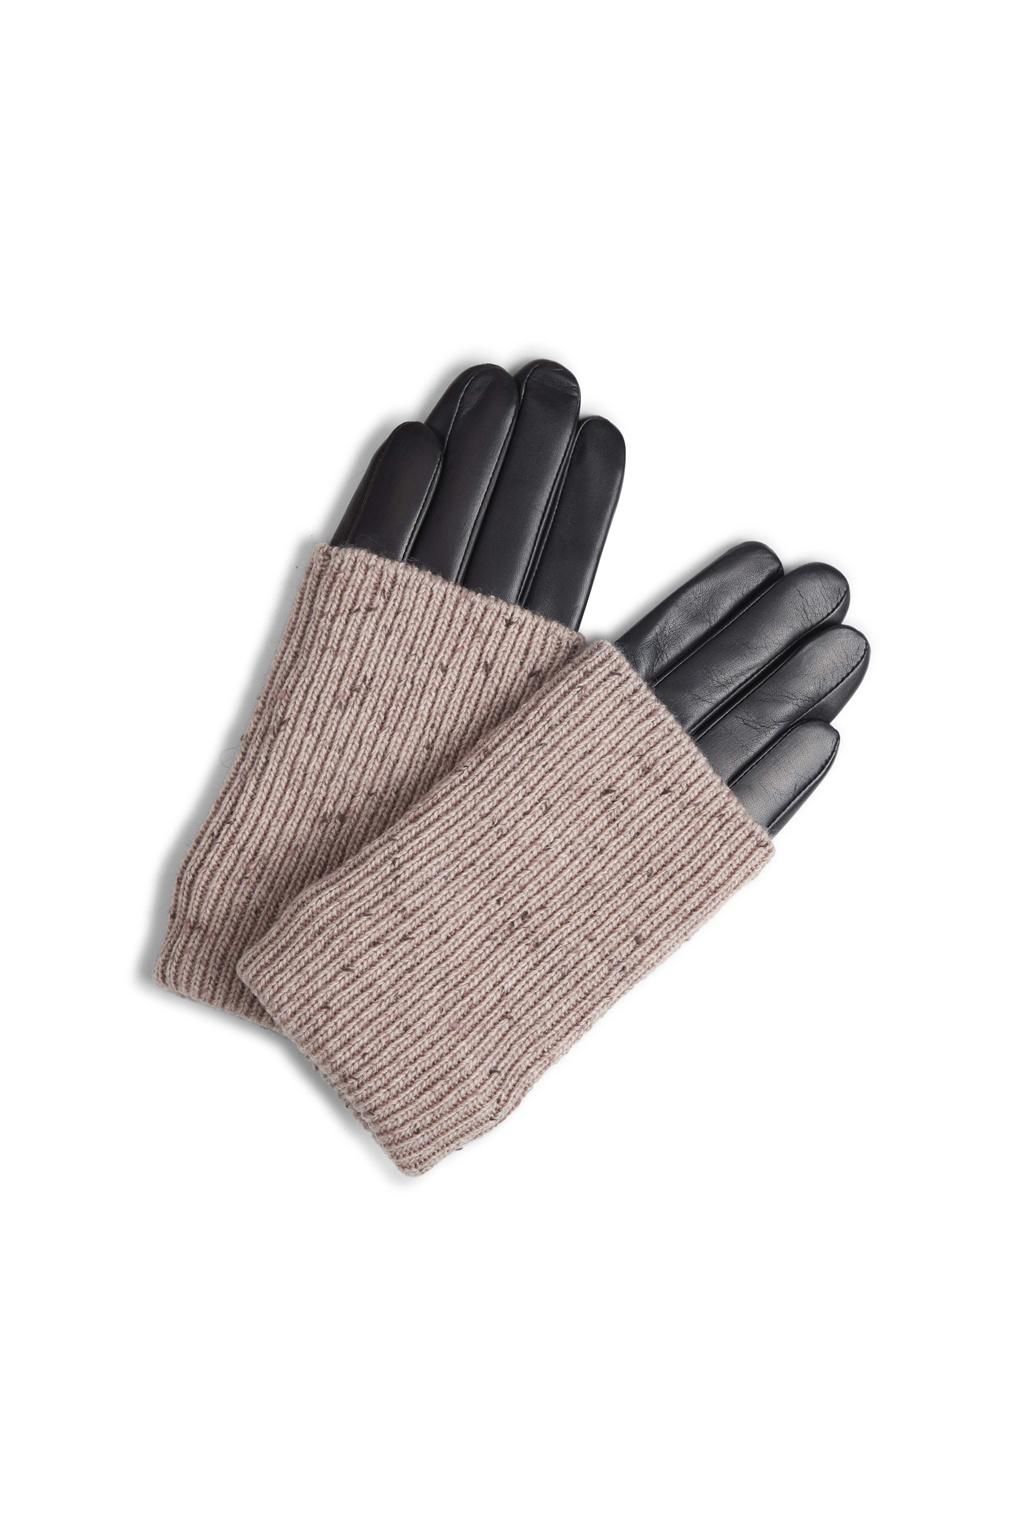 Helly Glove - Black w/ Mix Earth-1